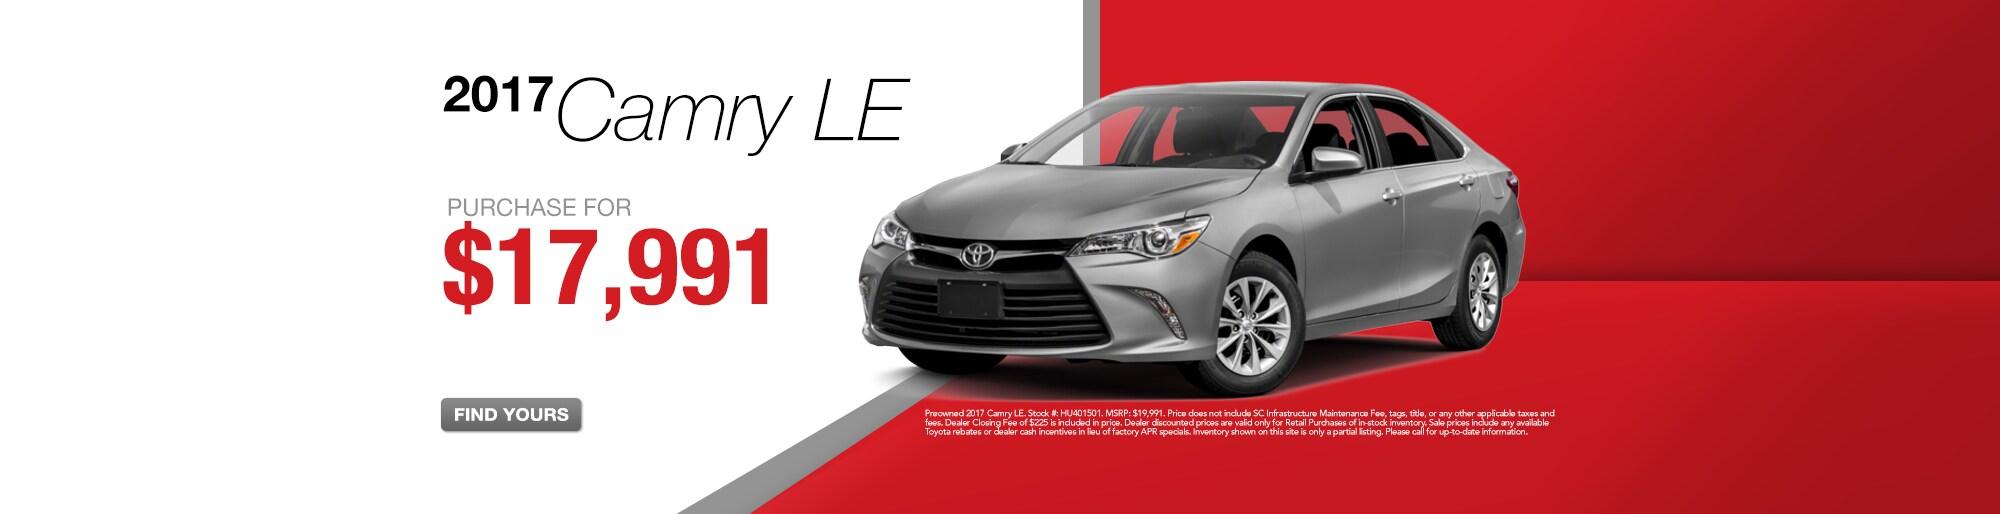 Toyota Greenville | Toyota Dealership | Cars Trucks & SUVs